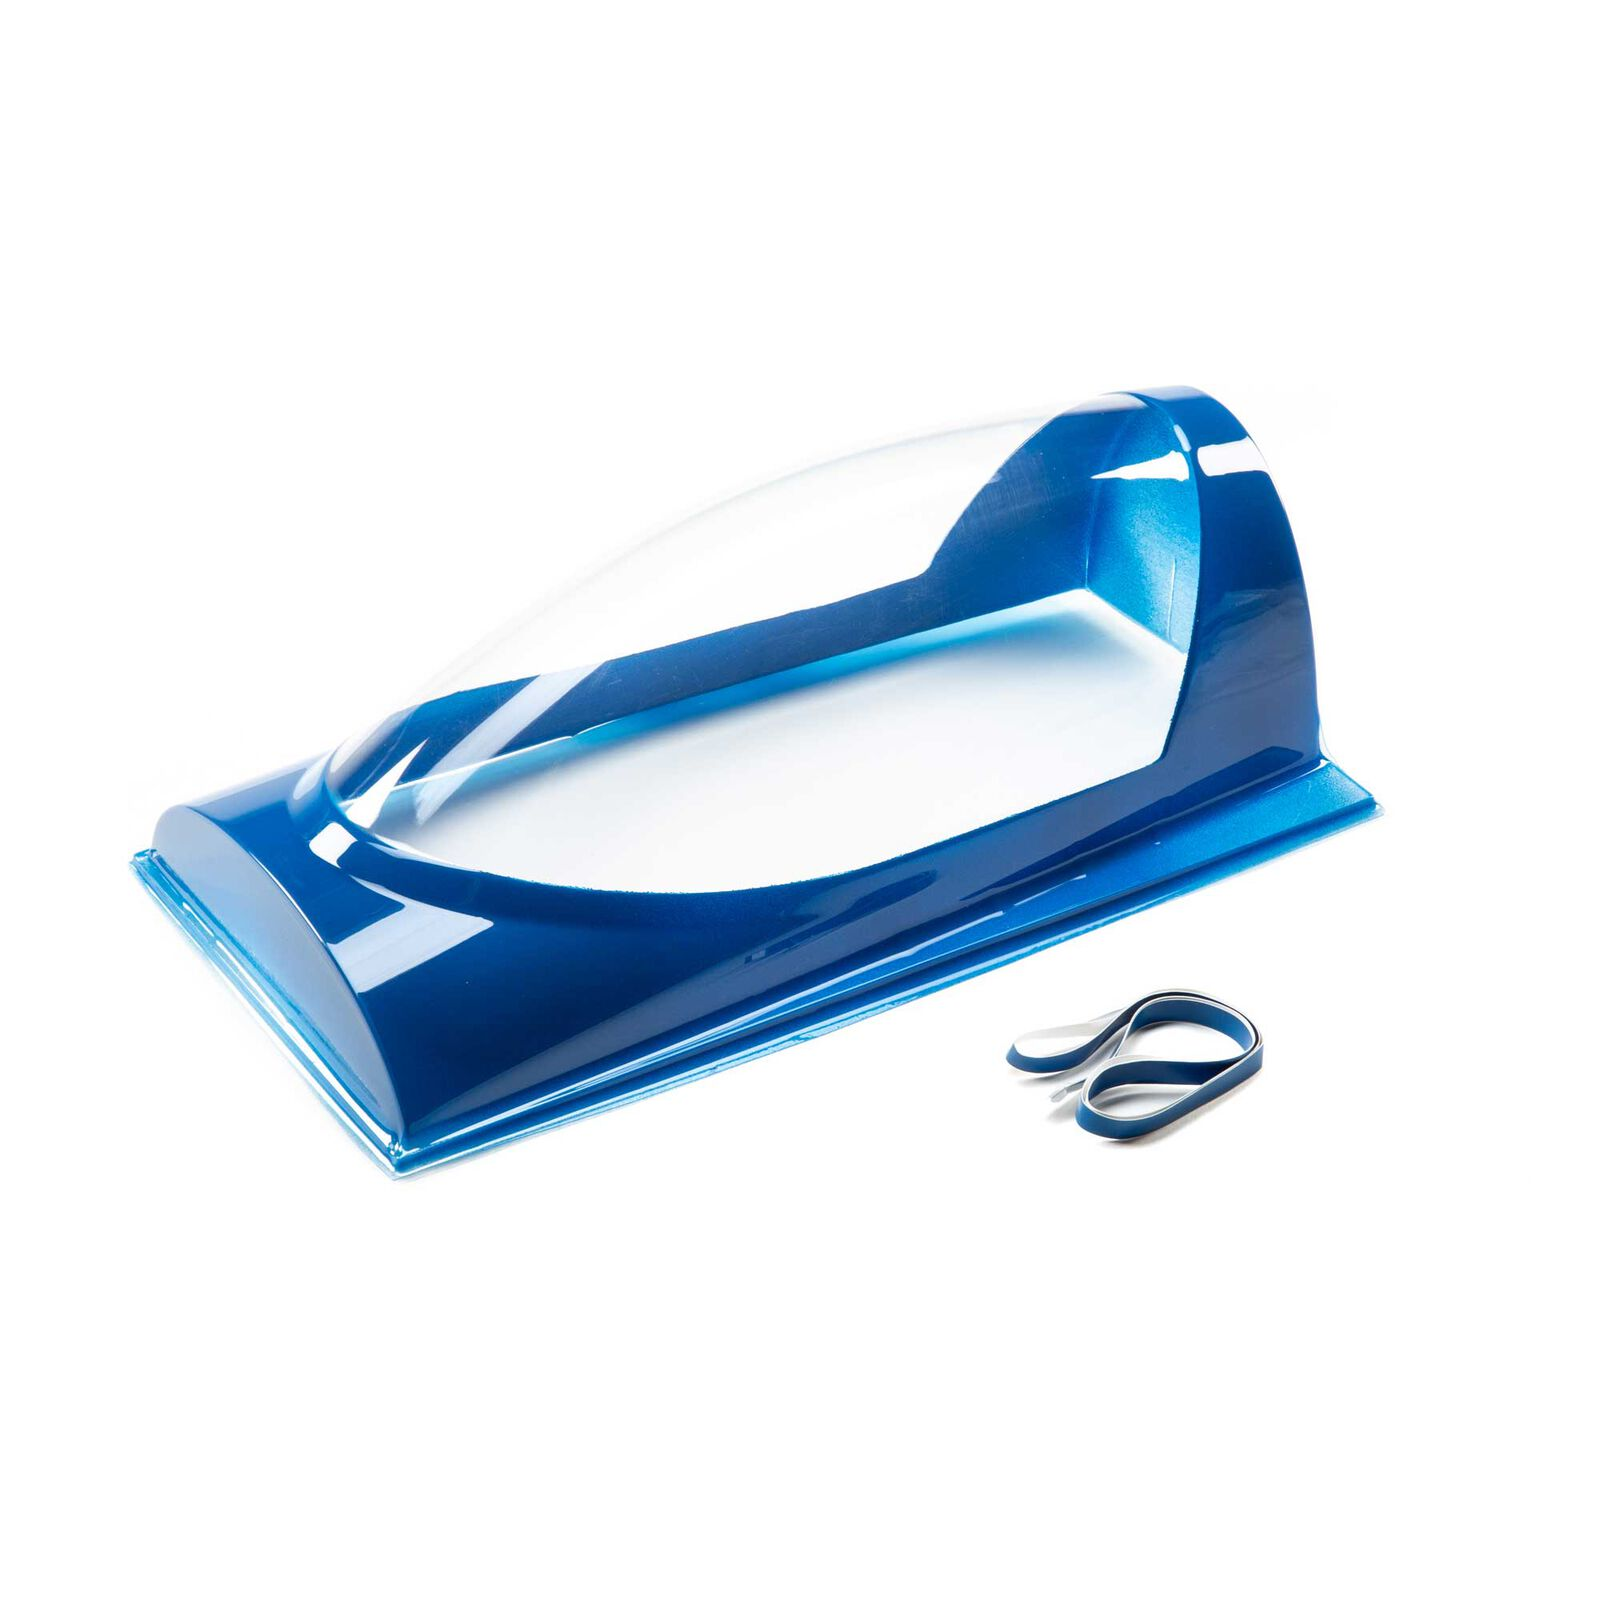 "Windscreen: Slick Aerobat EP 1.20-20cc ARF 67"""